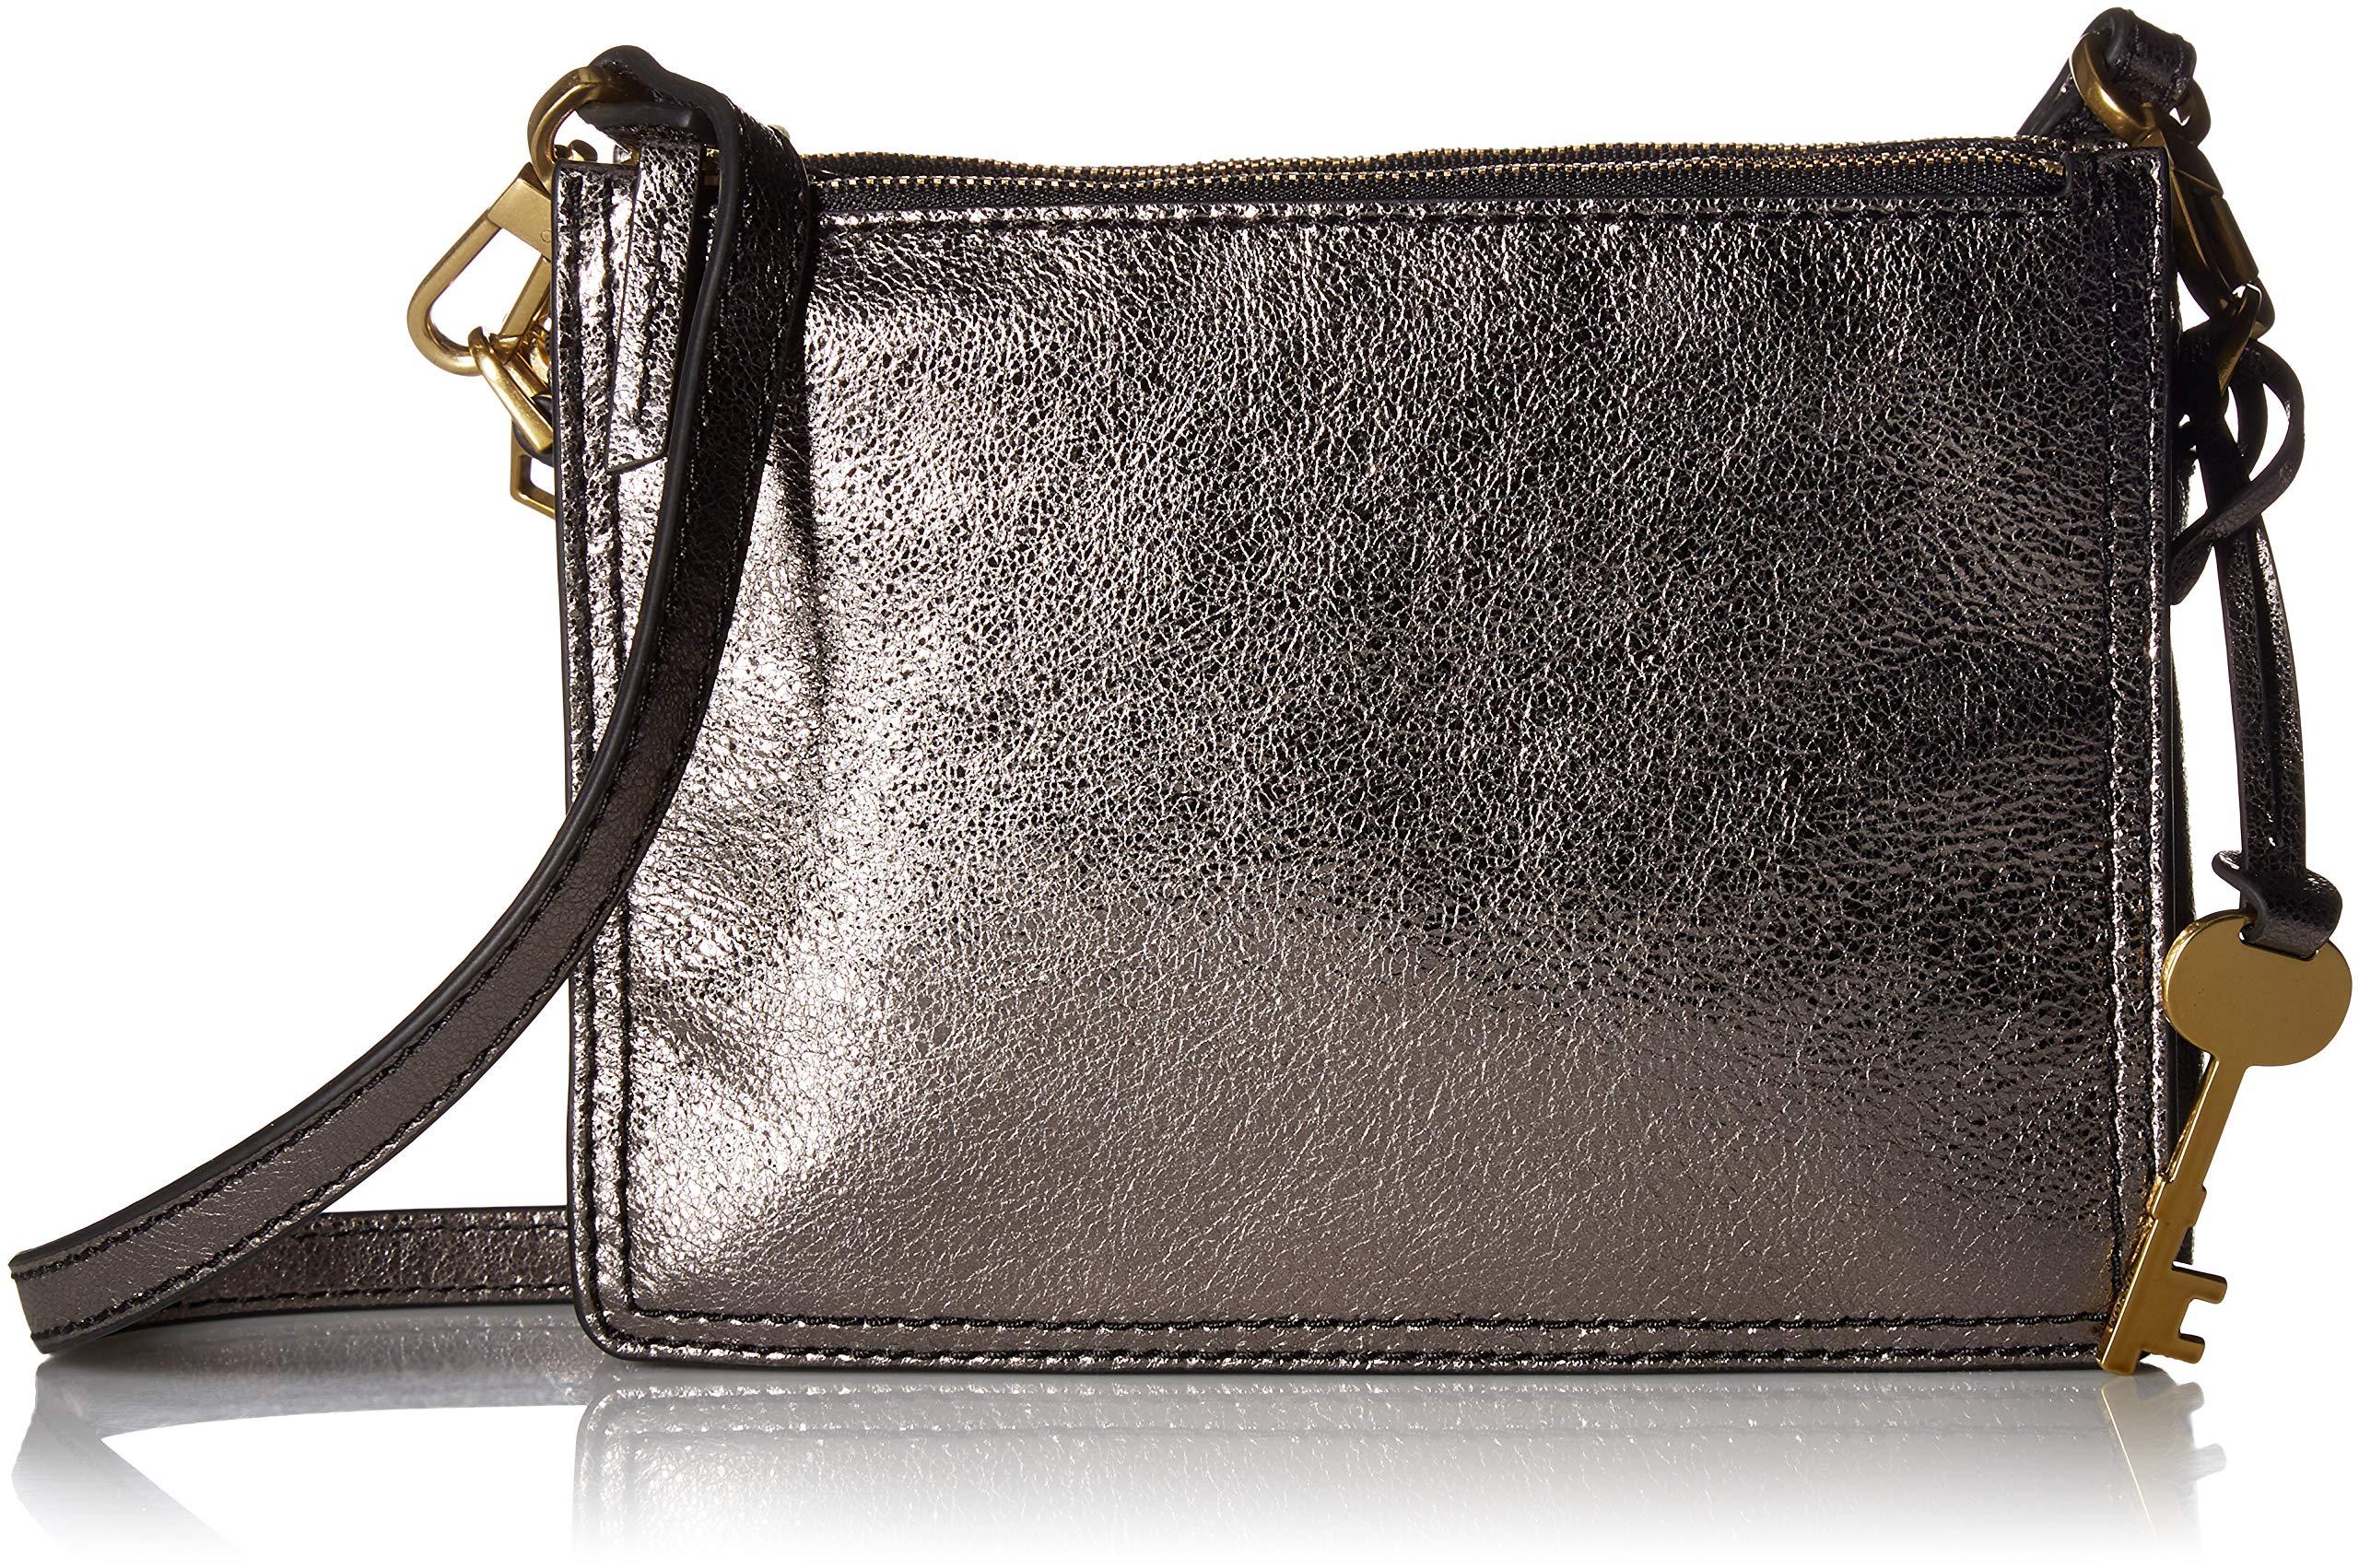 Fossil Campbell Crossbody Bag, Metallic Chrome